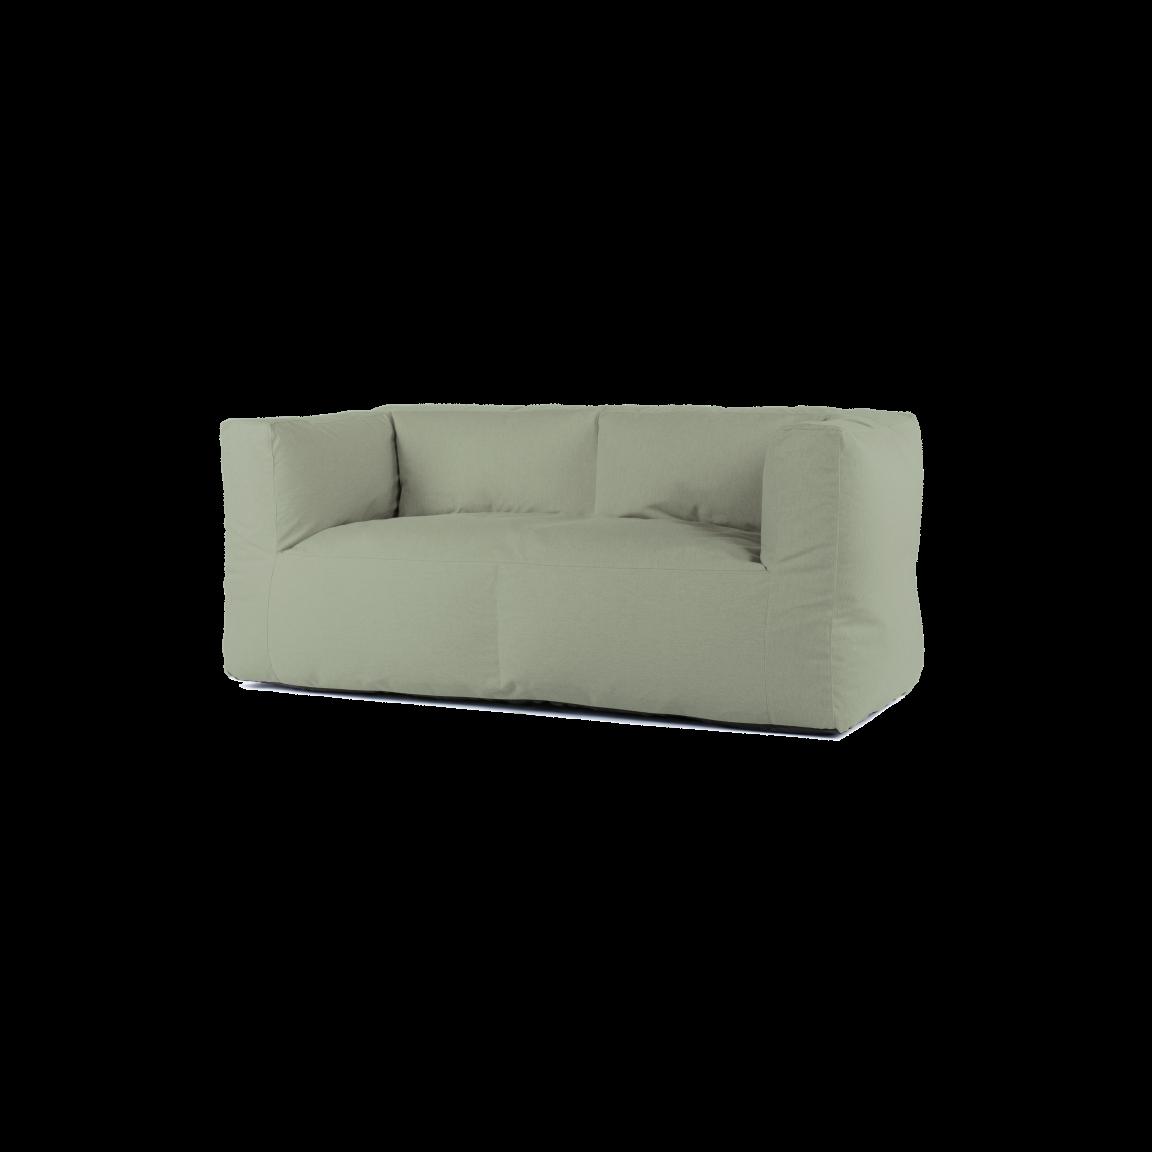 Two Seat | MOSSmerize ECO